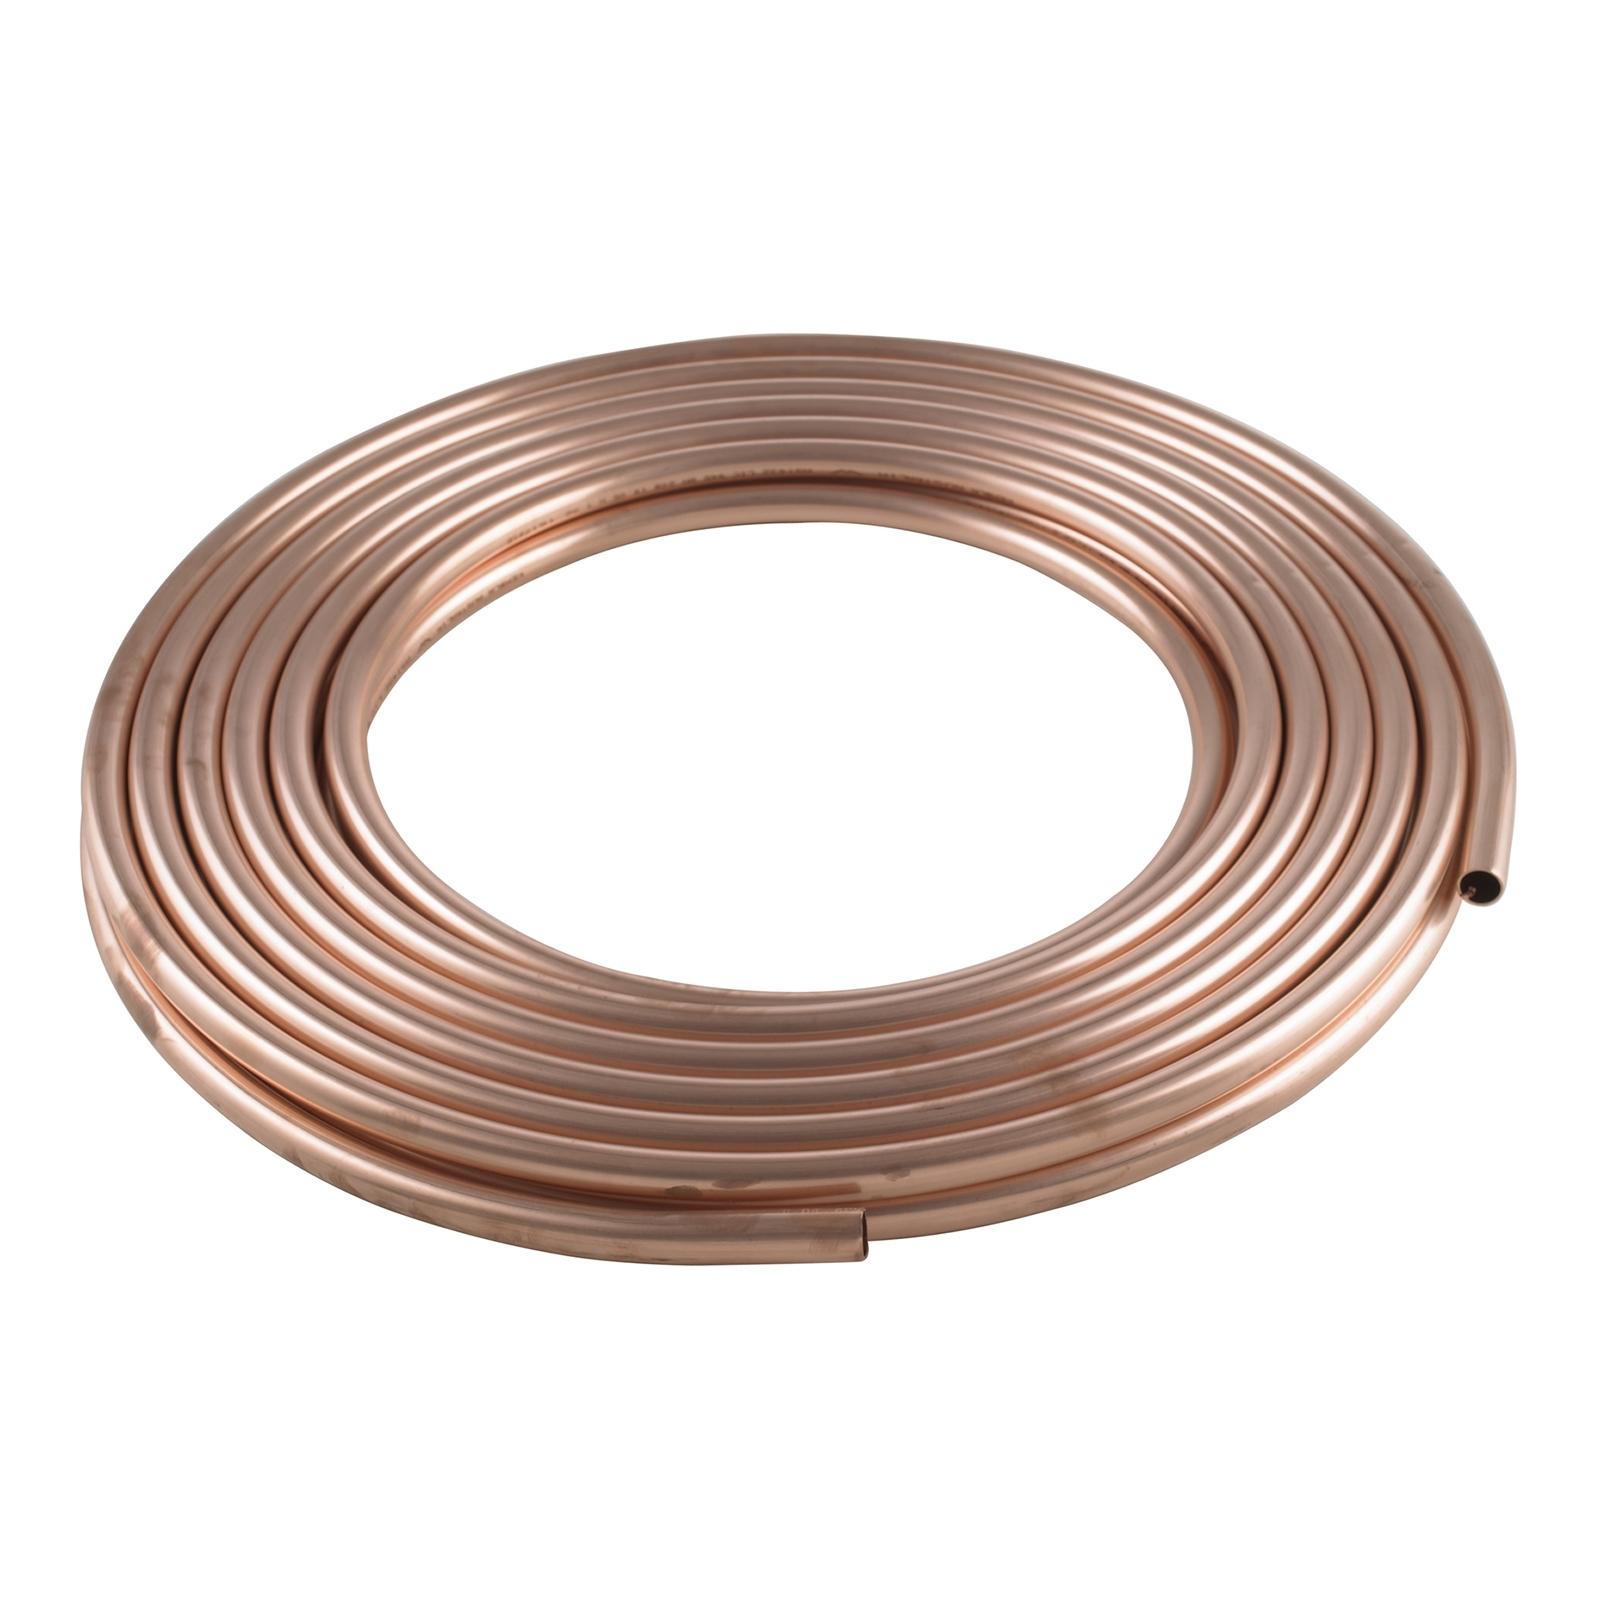 "Kembla 3/4"" x 18m Copper Annealed Coil"